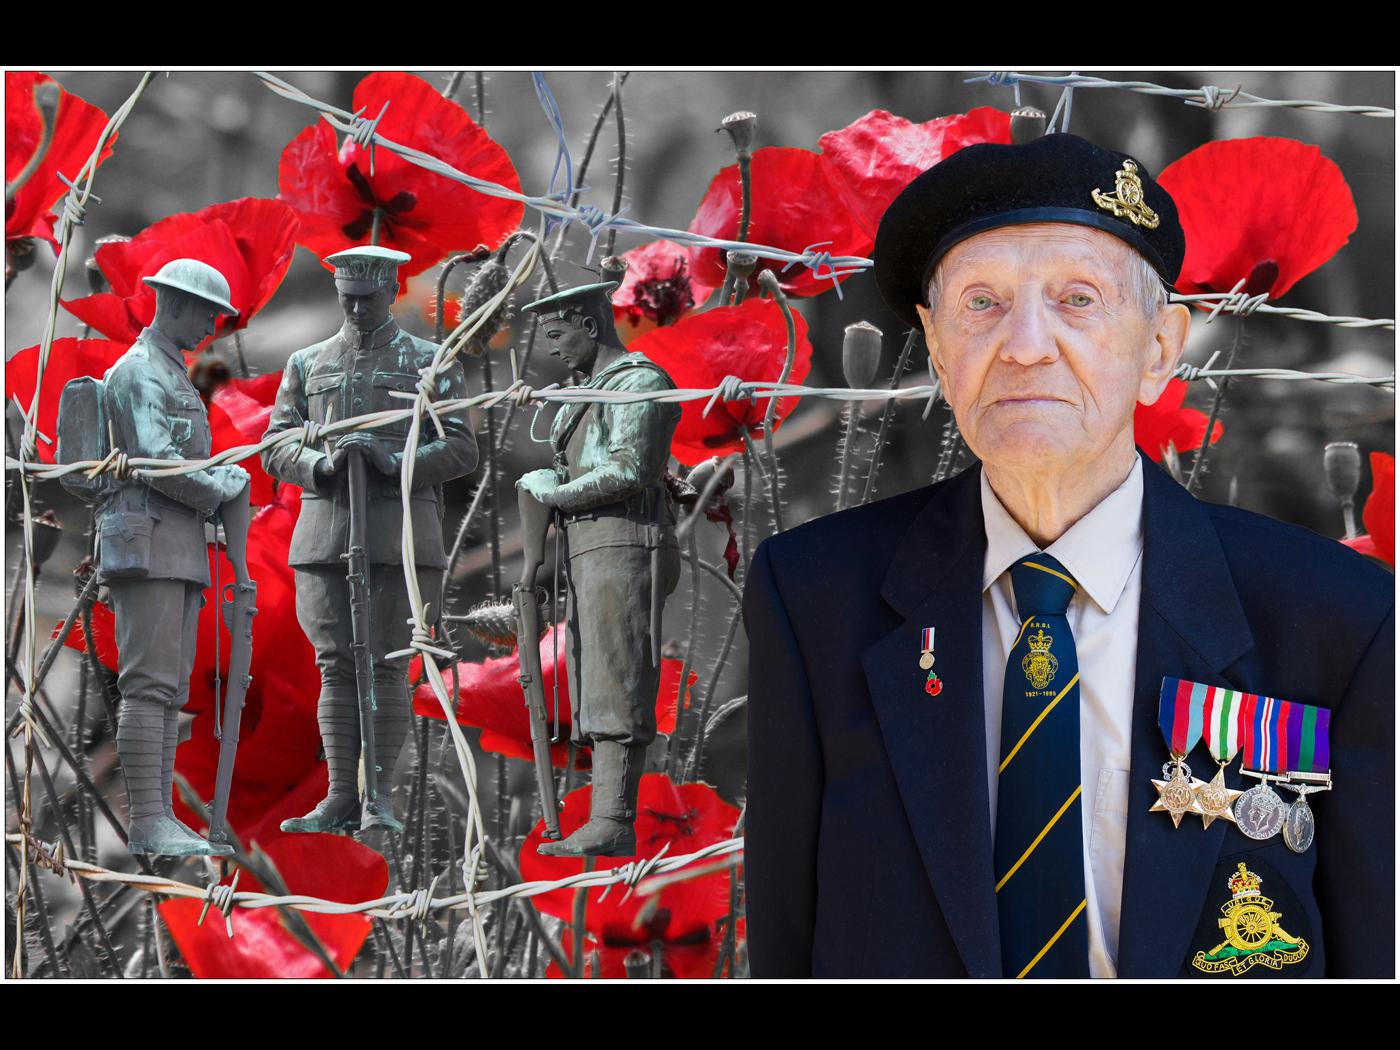 Remembering the Fallen 1914-2014